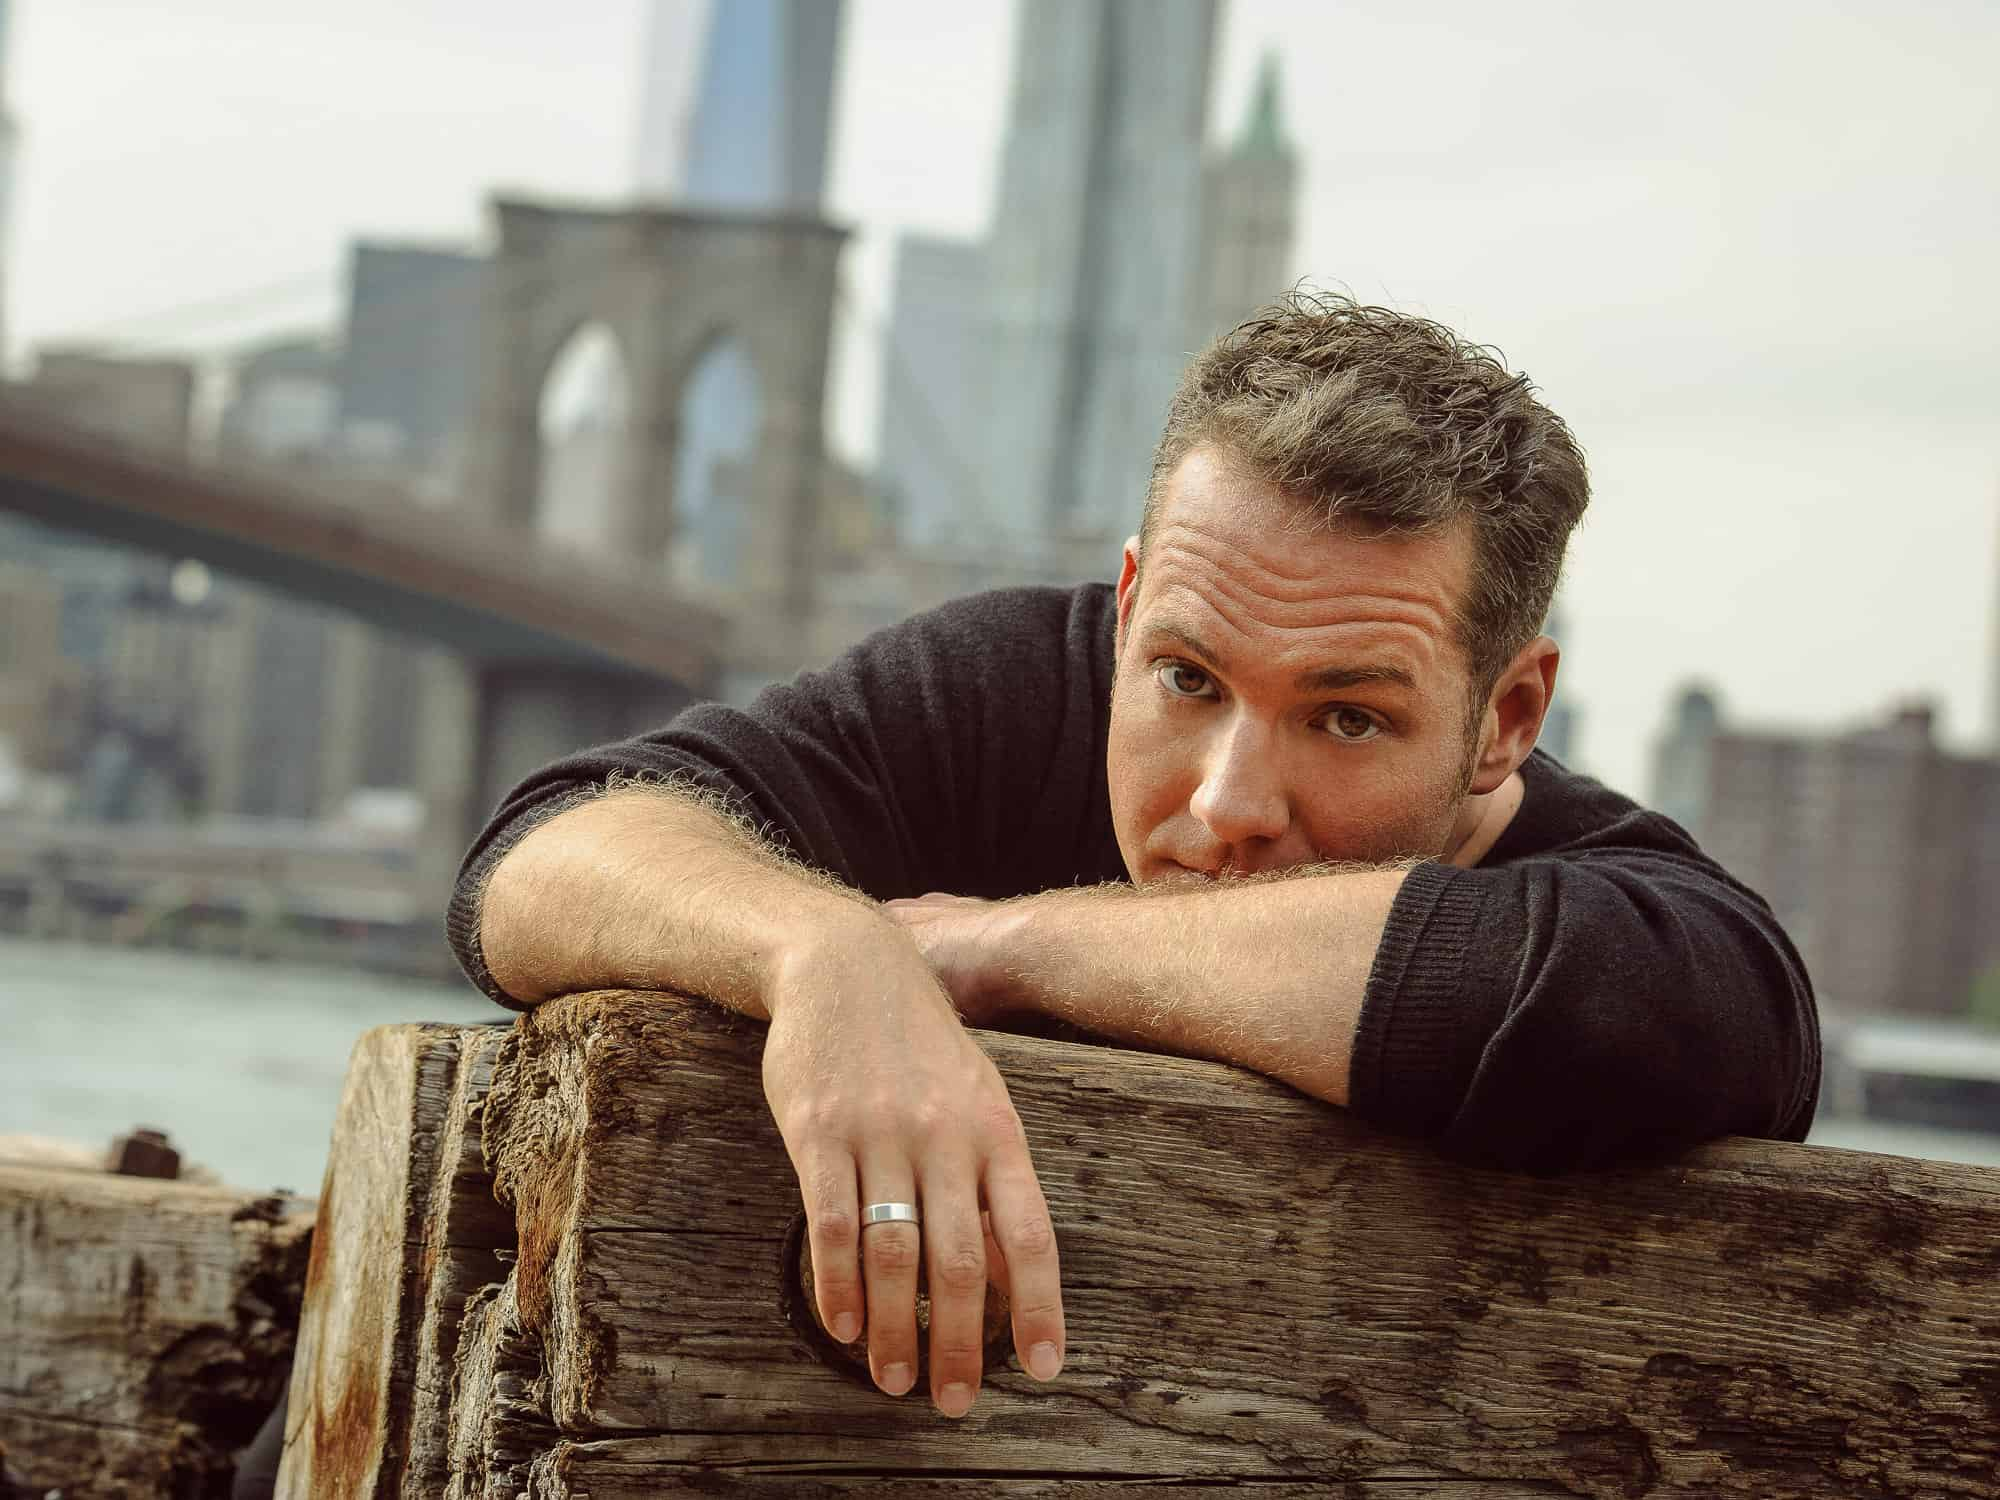 Professional Profile Pictures - Personal Branding Photographer Jasper J